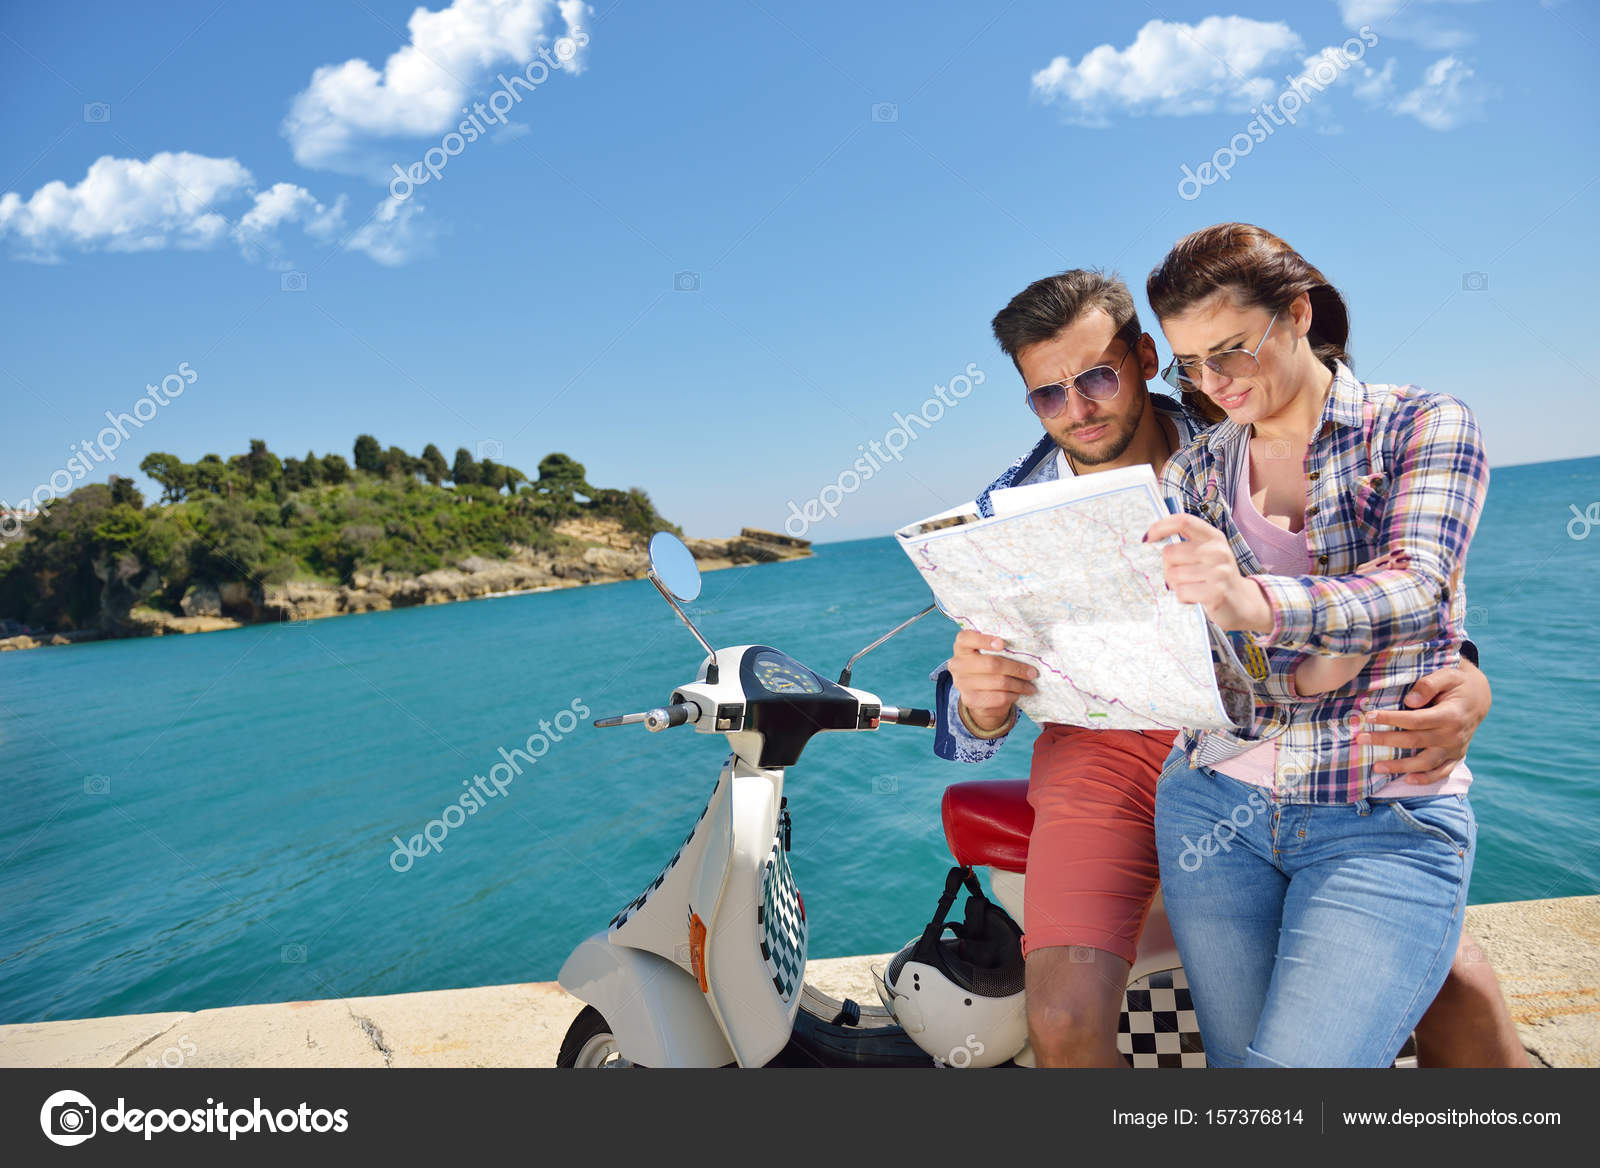 amorosa mapa Examinando el mapa juntos. Hermosa joven pareja amorosa sentados  amorosa mapa